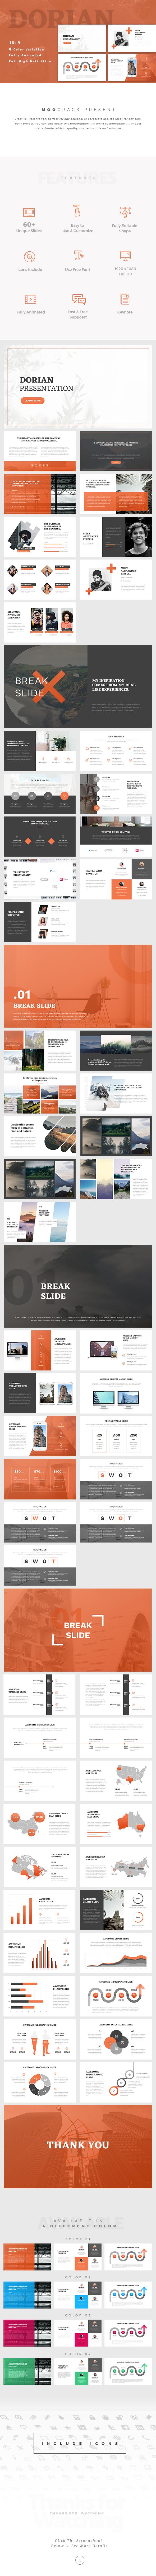 GraphicRiver Dorian Creative Keynote Template 21096839